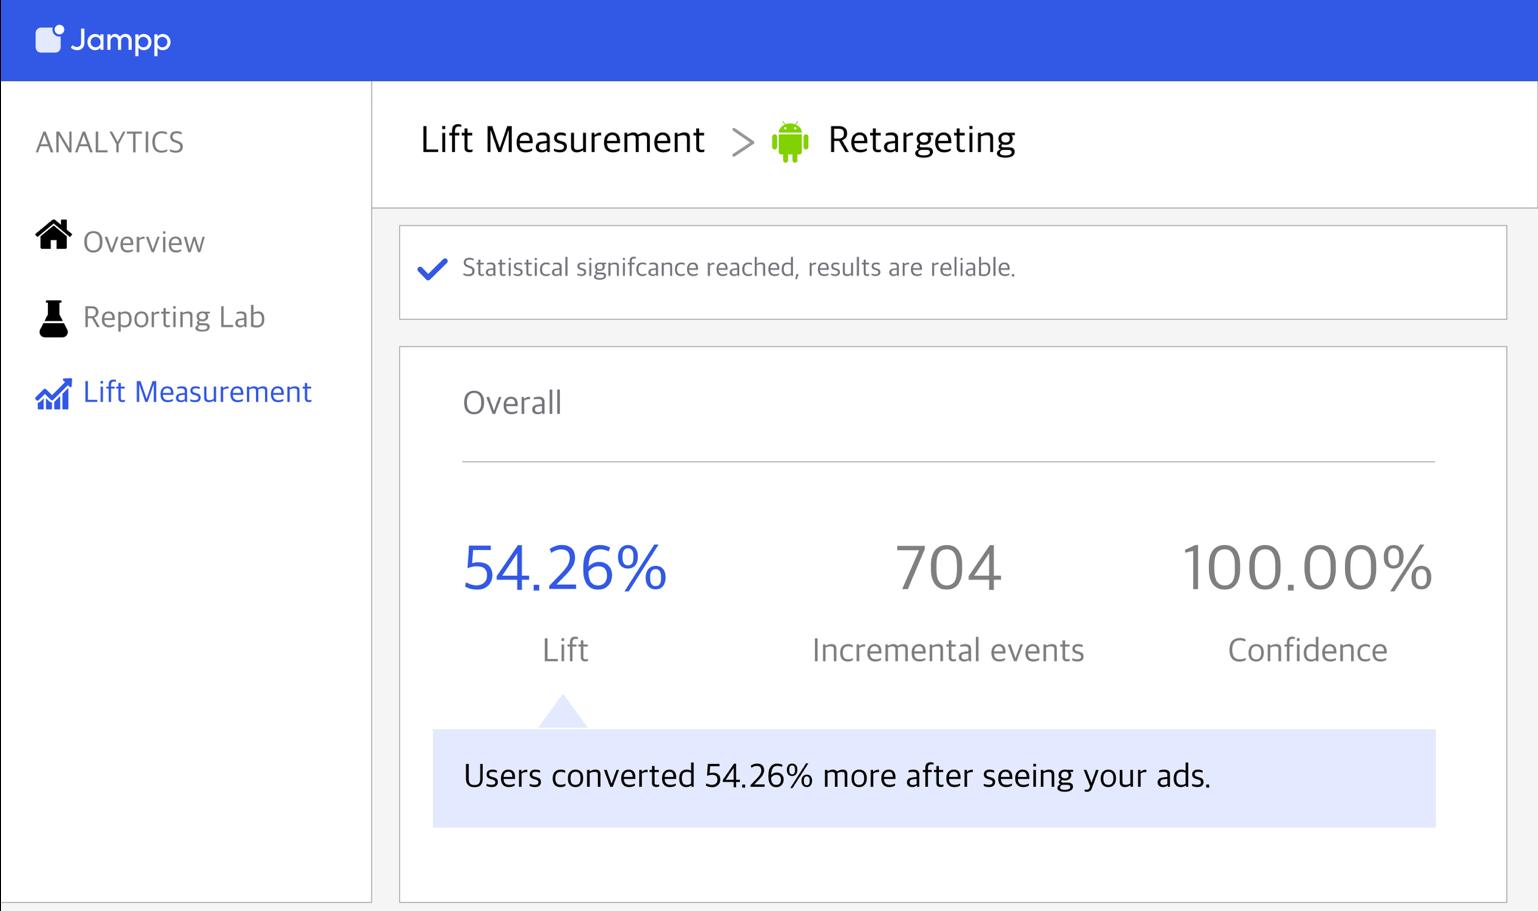 Jampp's Always-on Lift Measurement dashboard